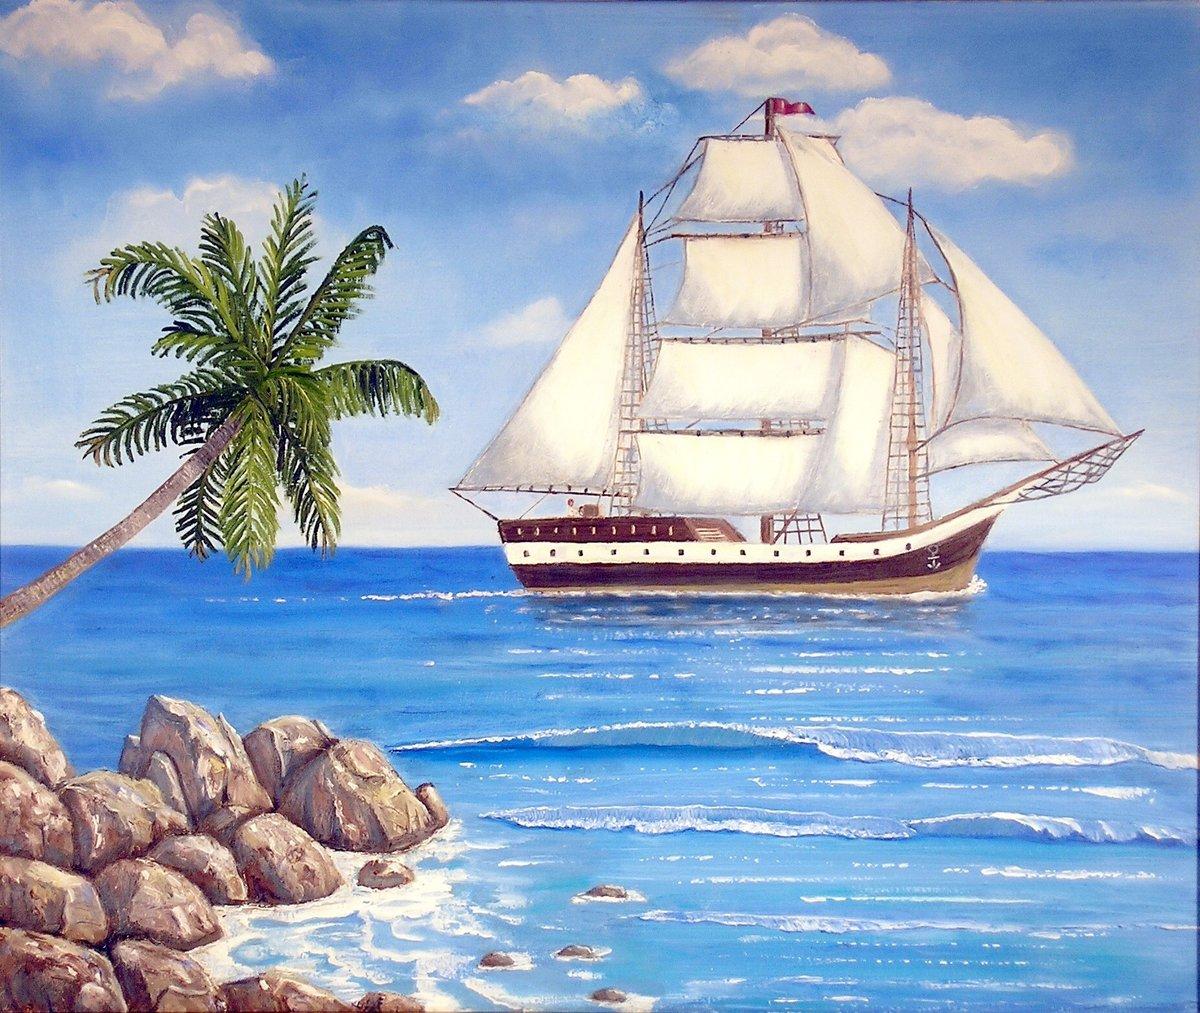 картинки рисунок парусник море при получение товара